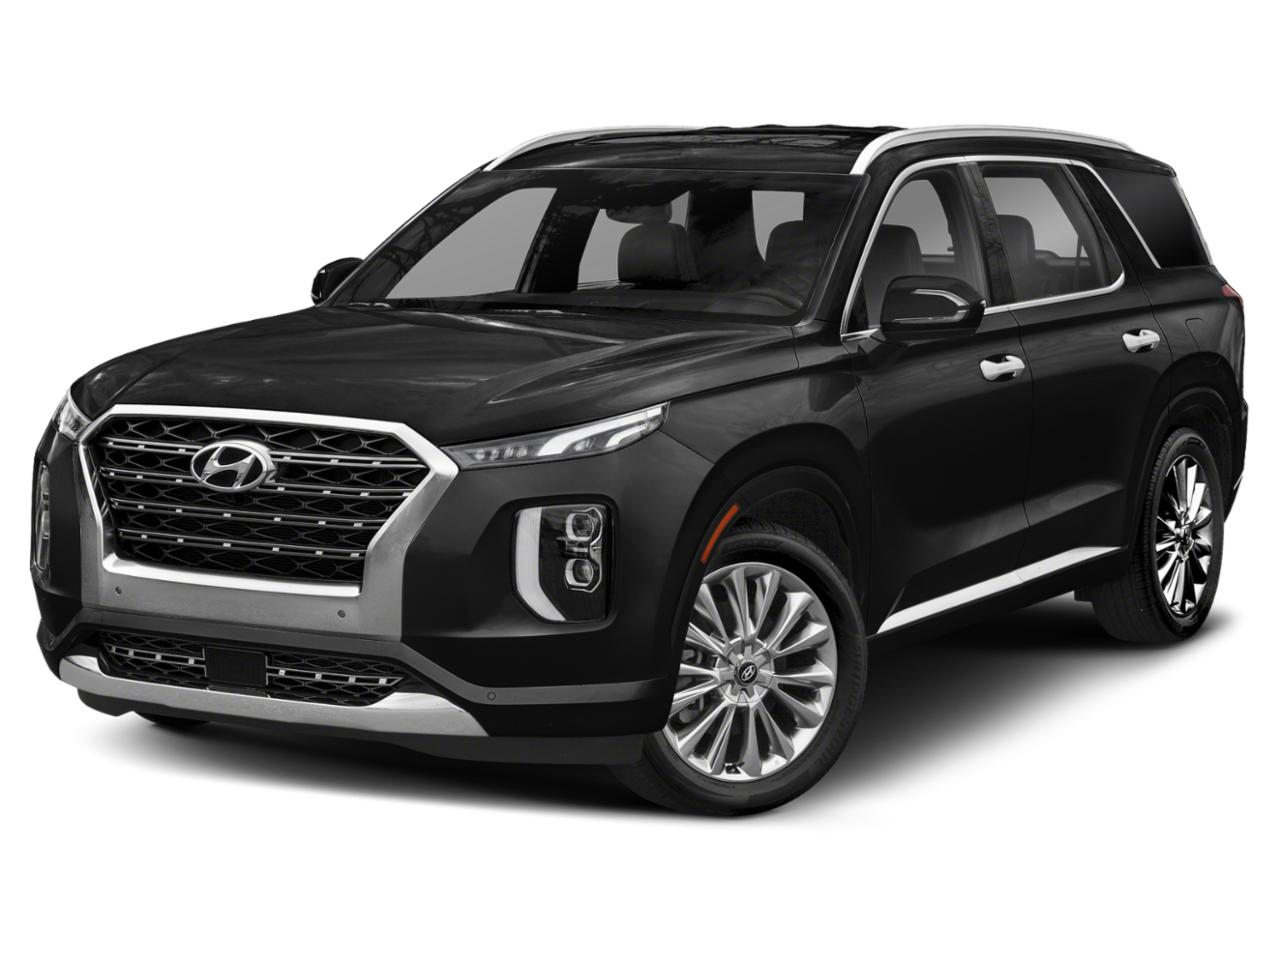 2020 Hyundai Palisade Vehicle Photo in Colorado Springs, CO 80905